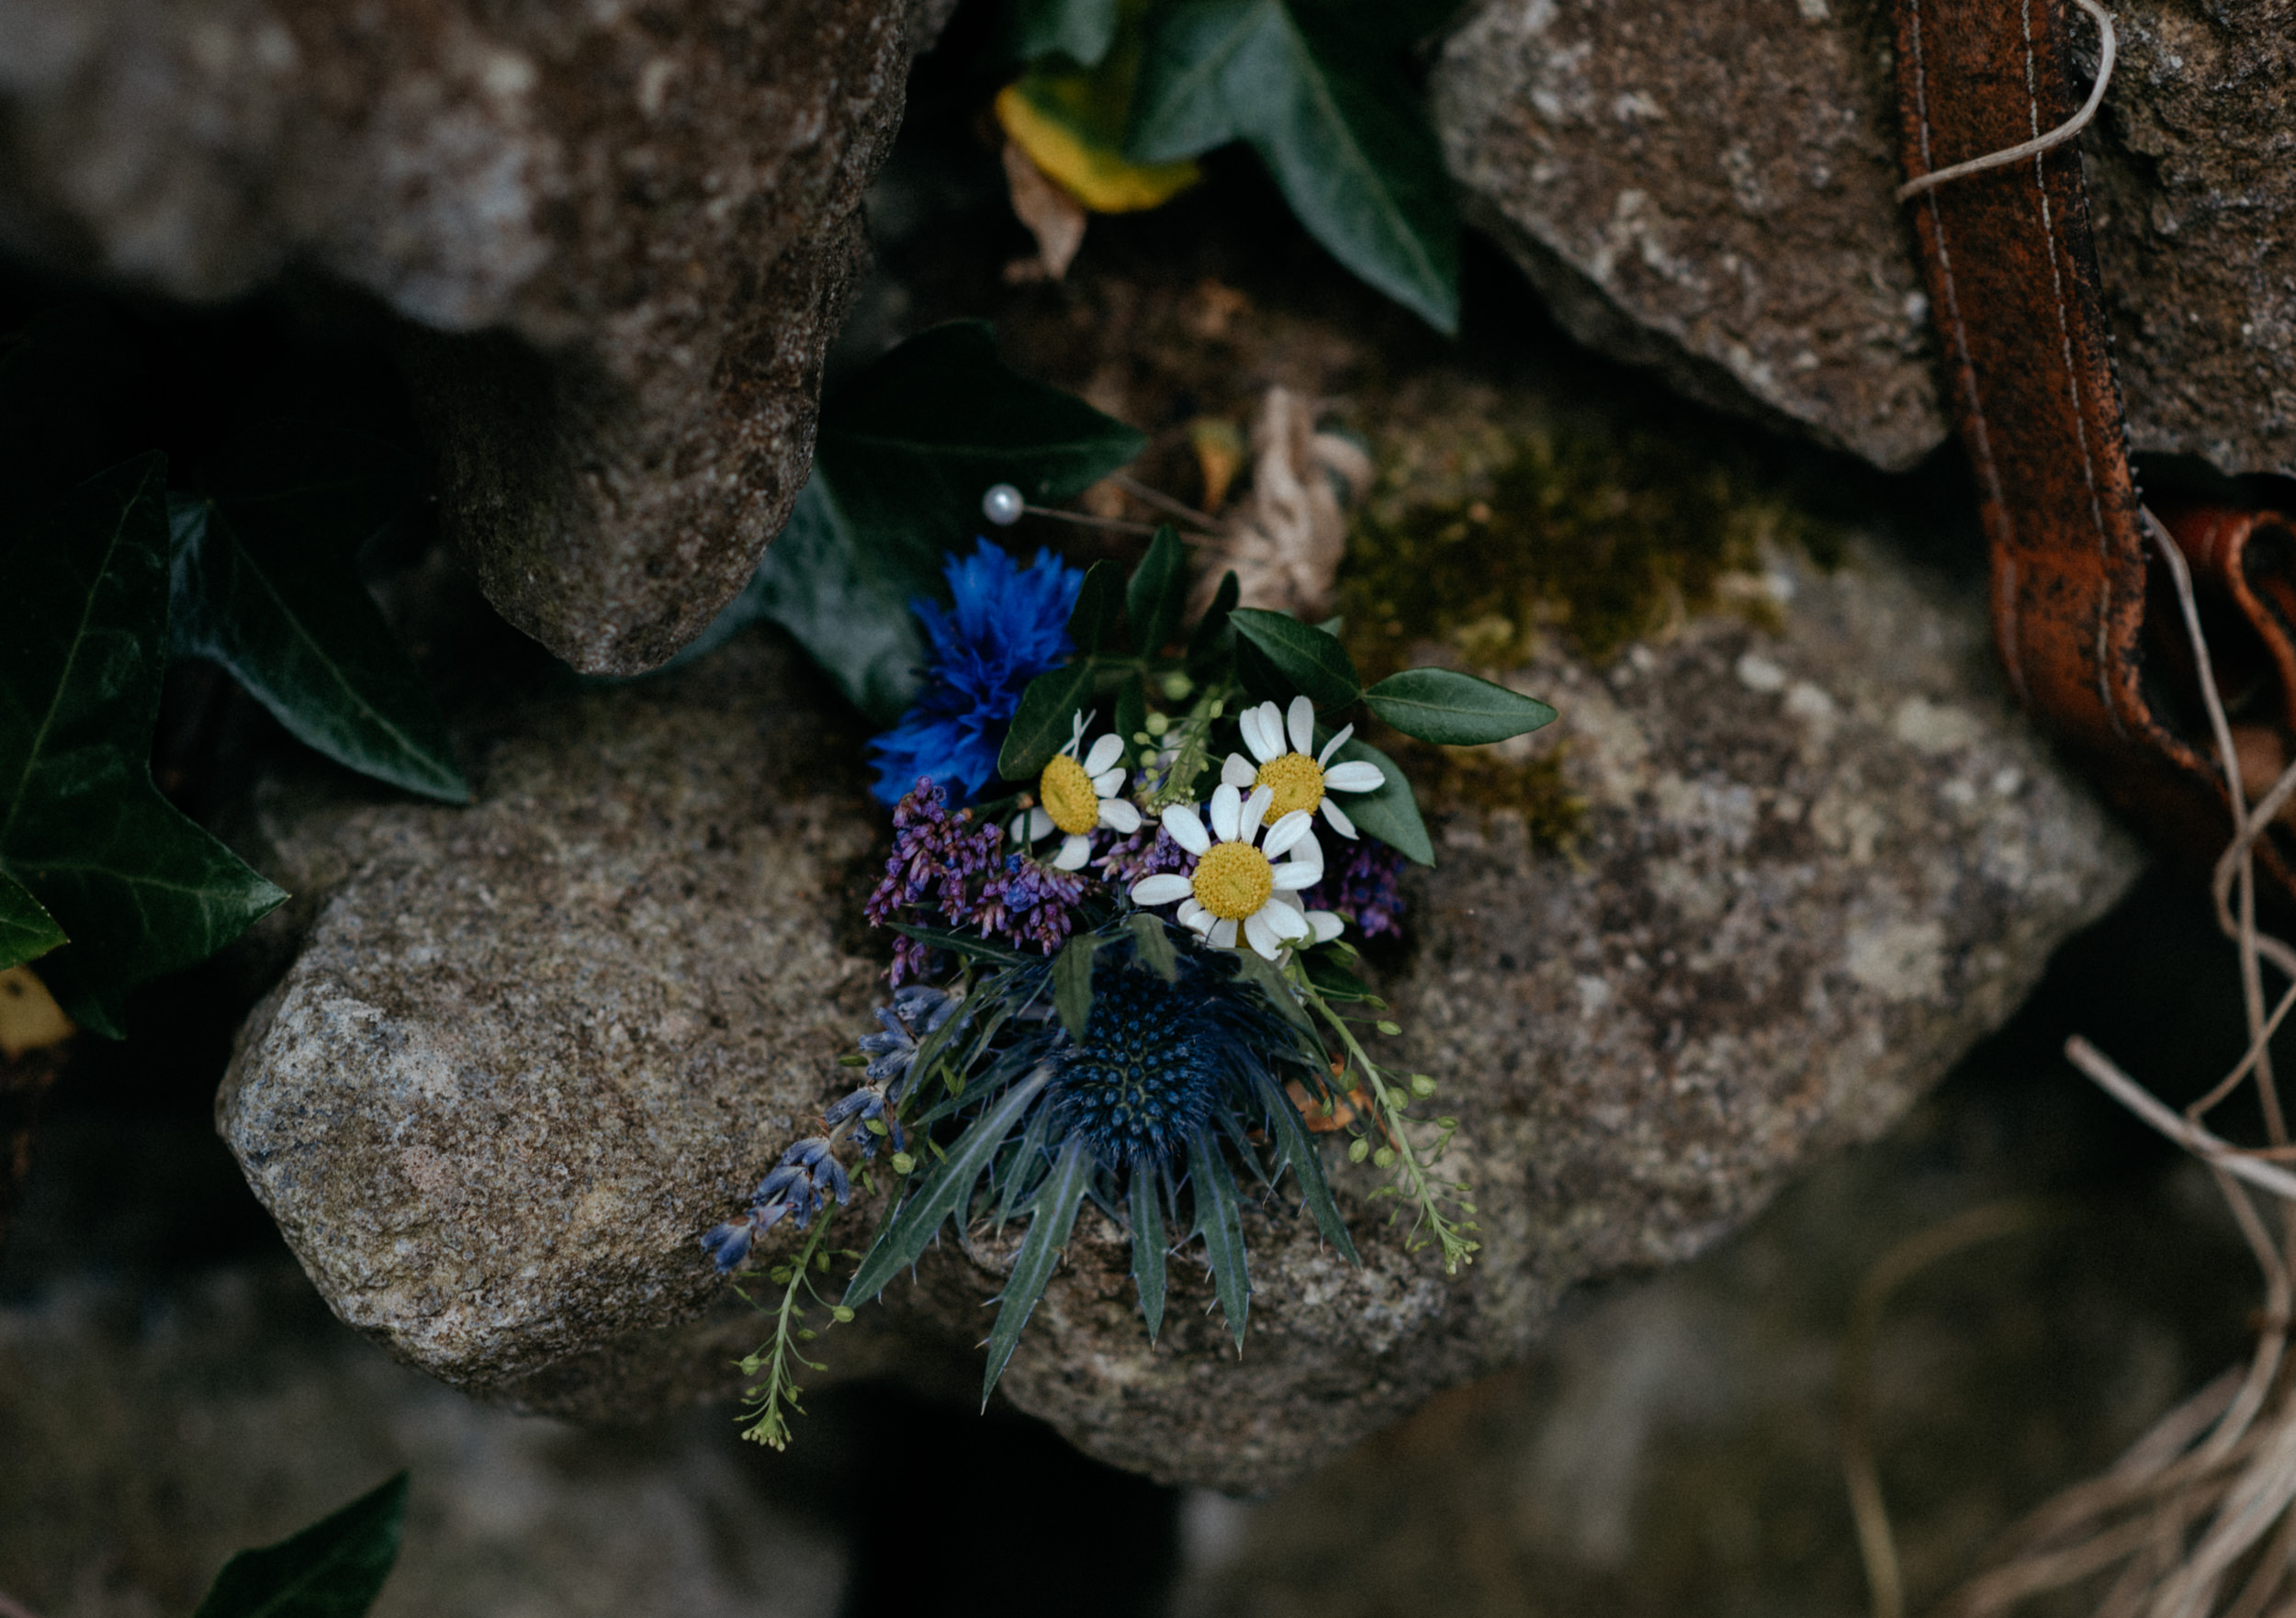 Wedding florals at Newtown Castle wedding in County Clare, Ireland. Ireland wedding and elopement photographer.